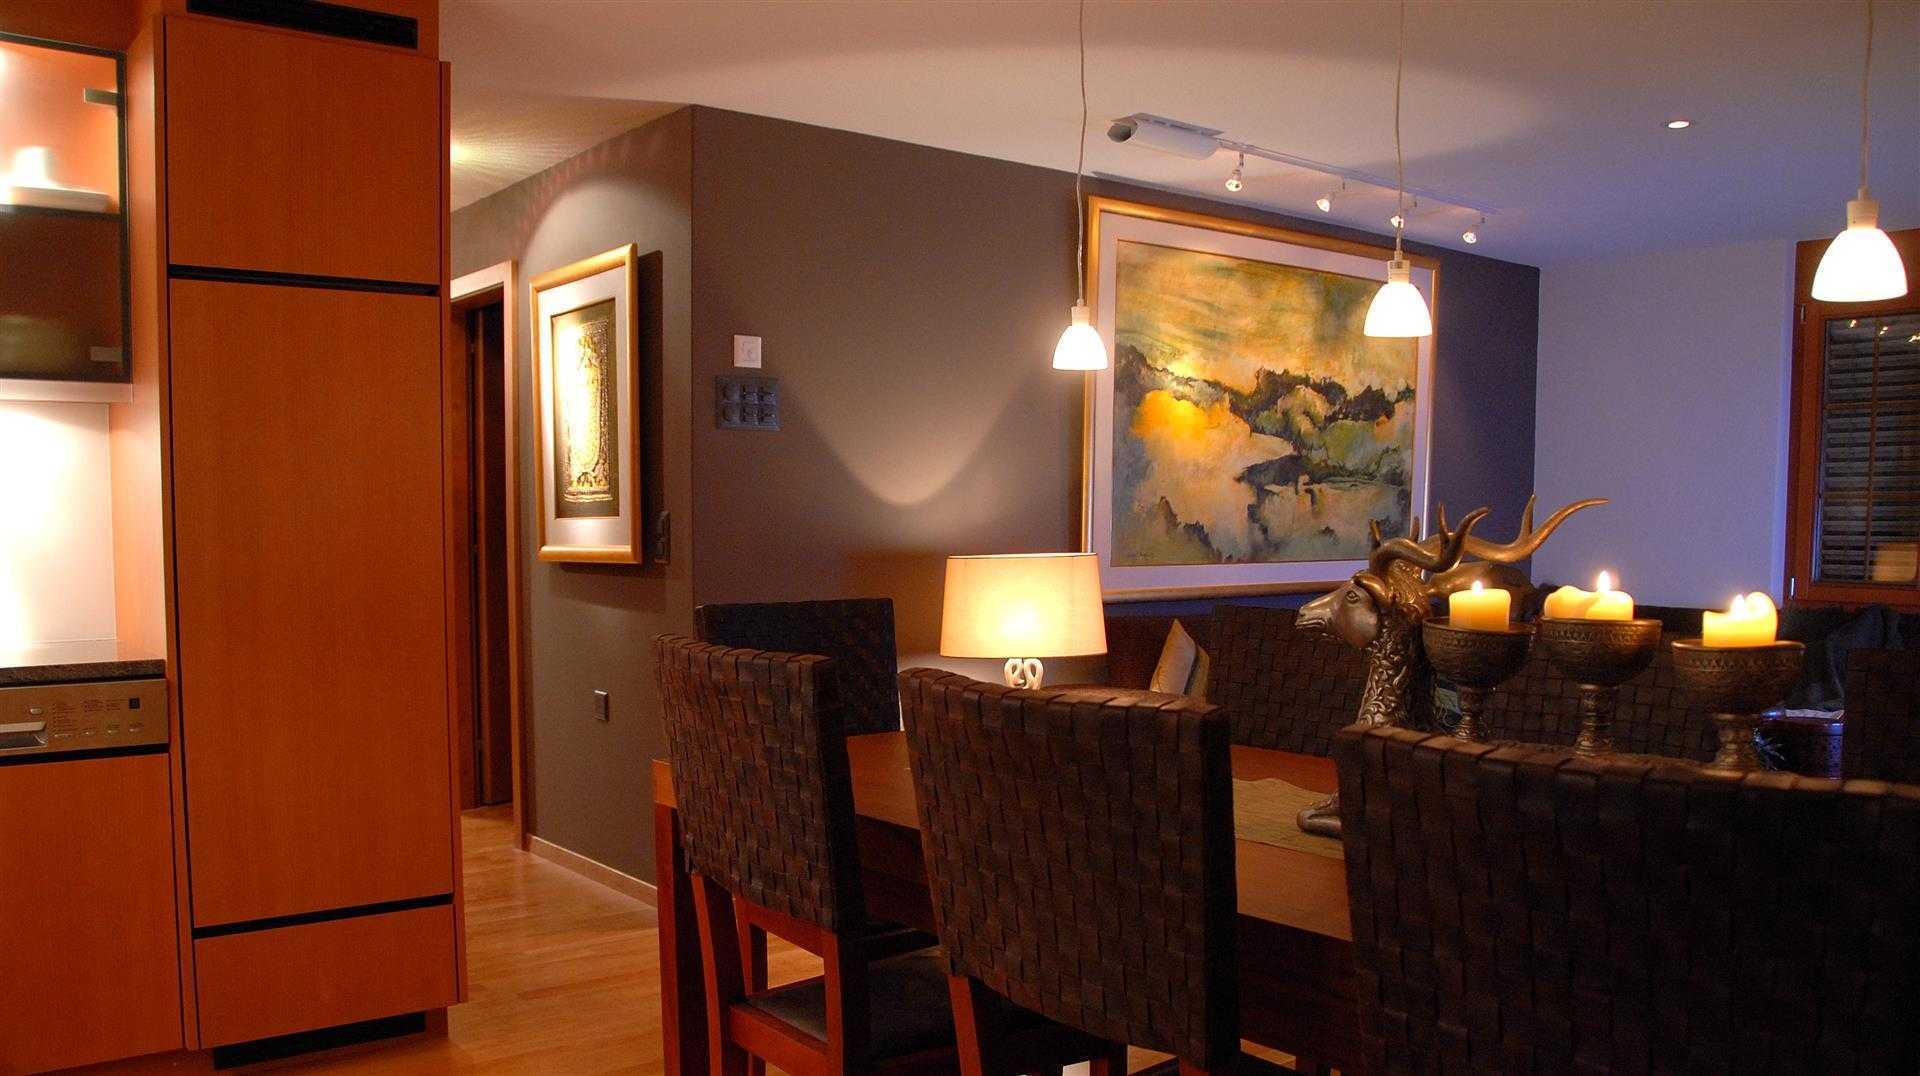 Agung Budi Raharsa   Architecture & Engineering Lenk Hotel - Switzerland Switzerland Switzerland Dining-2 Minimalis  12760